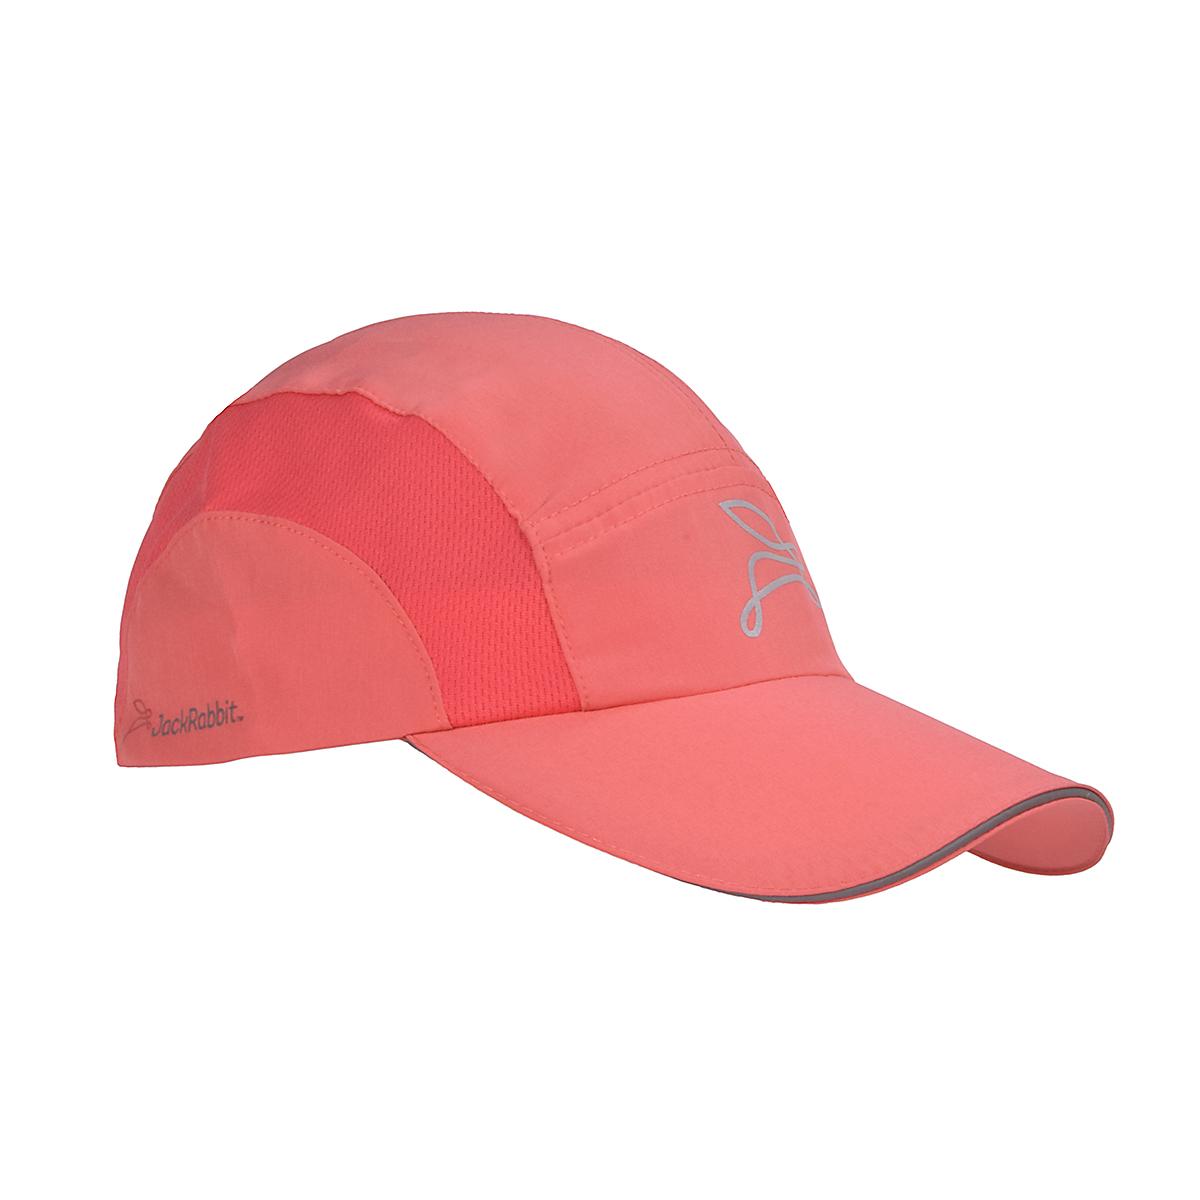 JackRabbit Run Hat - Color: Coral - Size: One Size, Coral, large, image 3